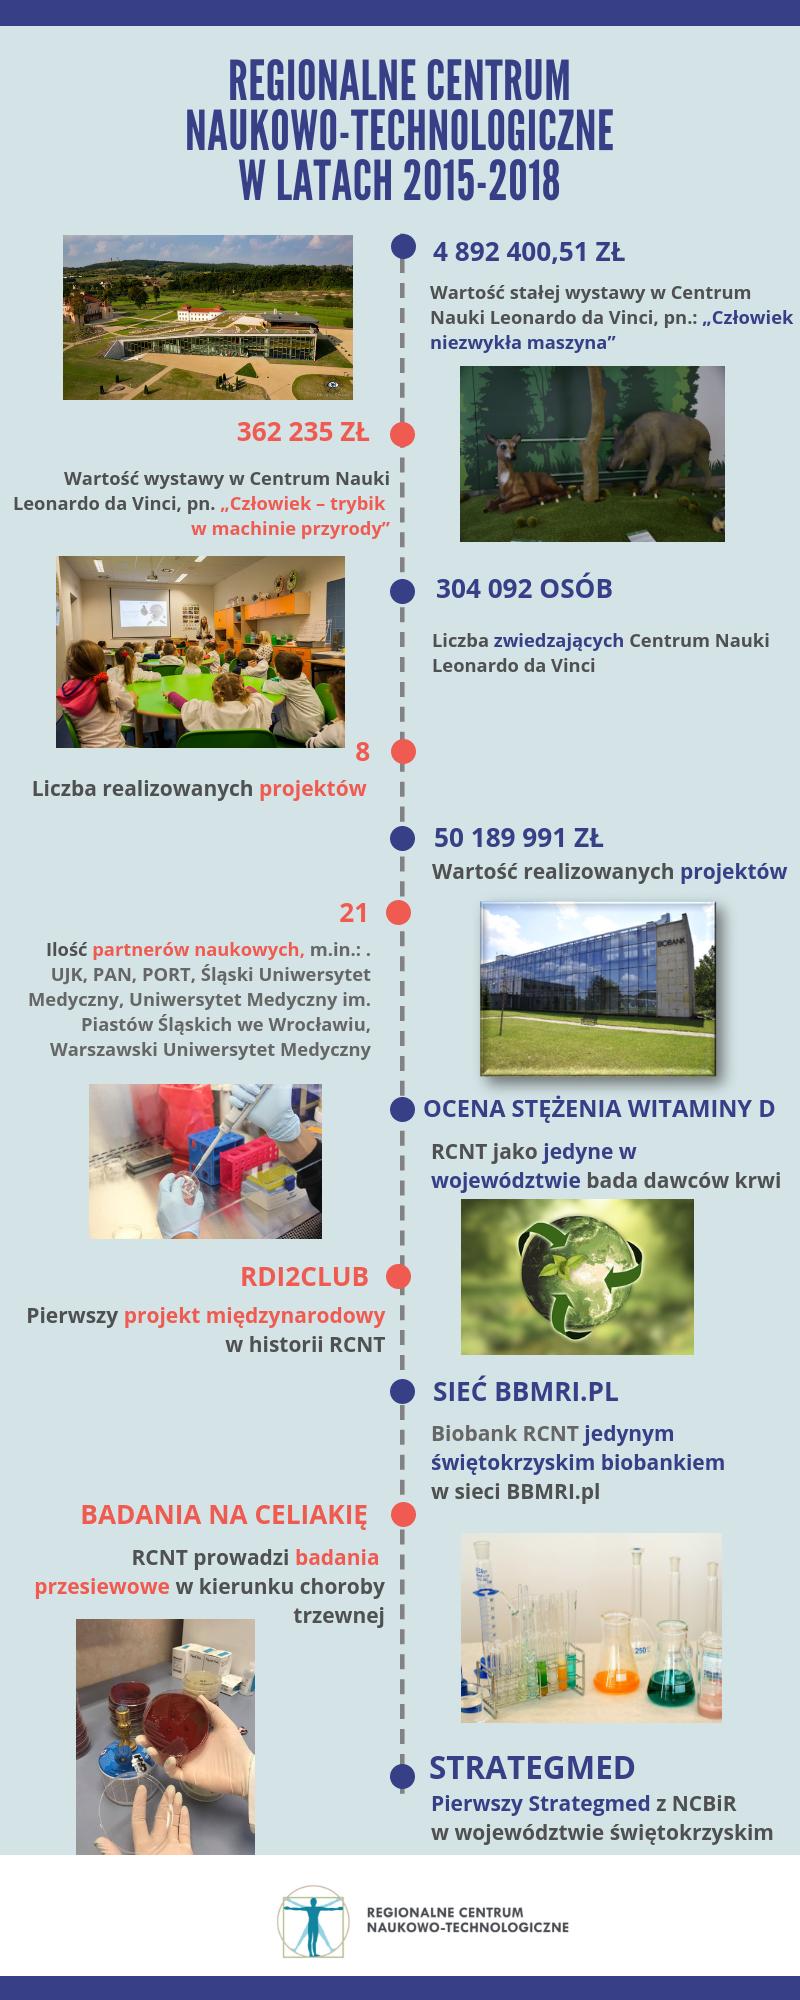 RCNT_w latach 2015-2018